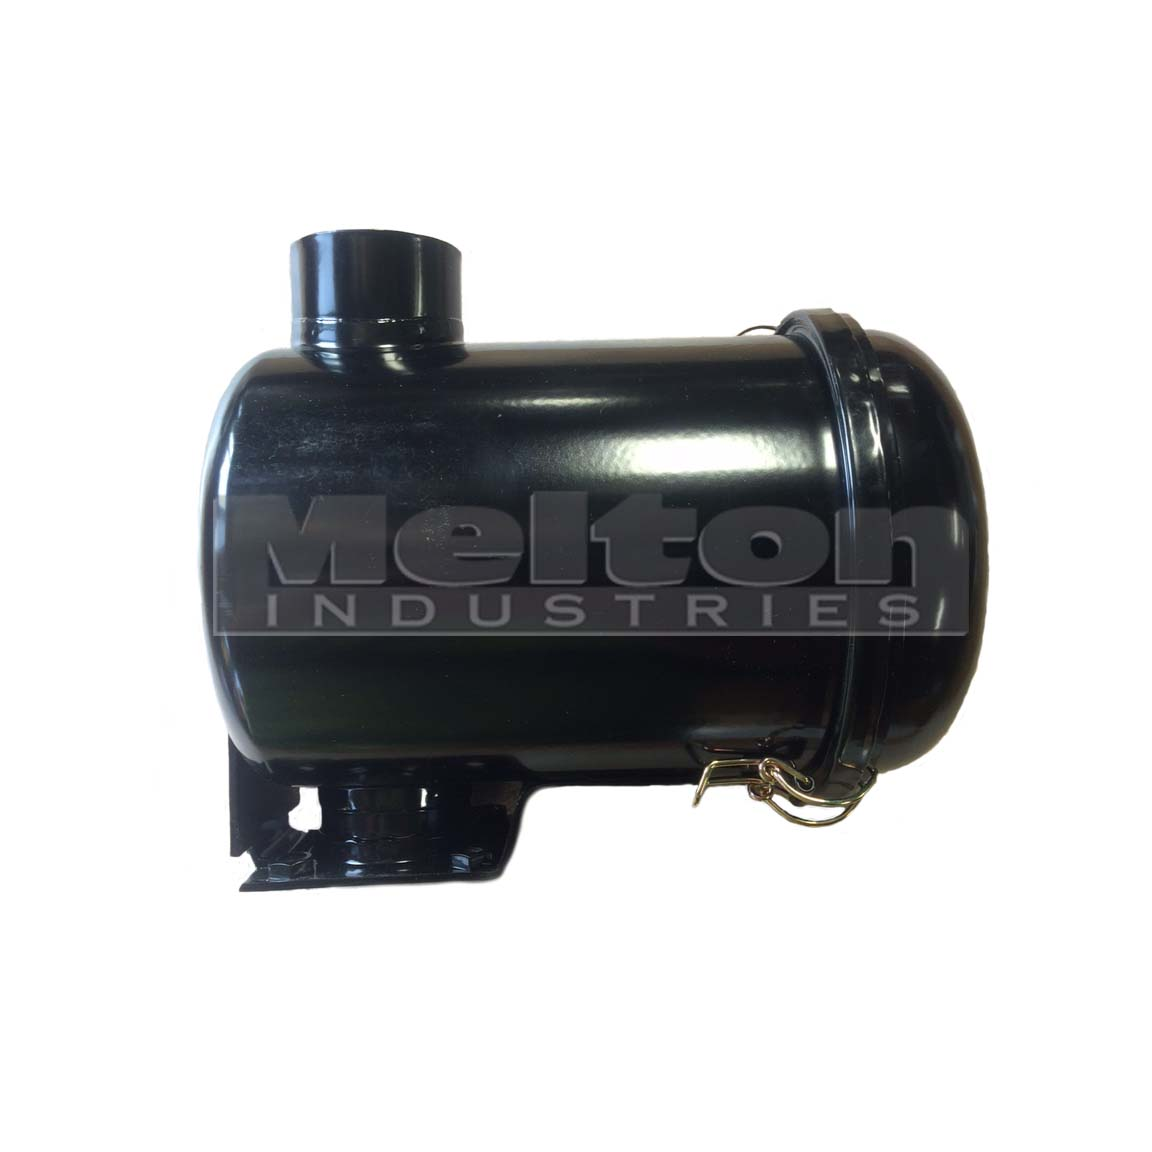 Cummins Diesel Engines >> HATZ Diesel Oil Bath Air Filter Assembly 01122210